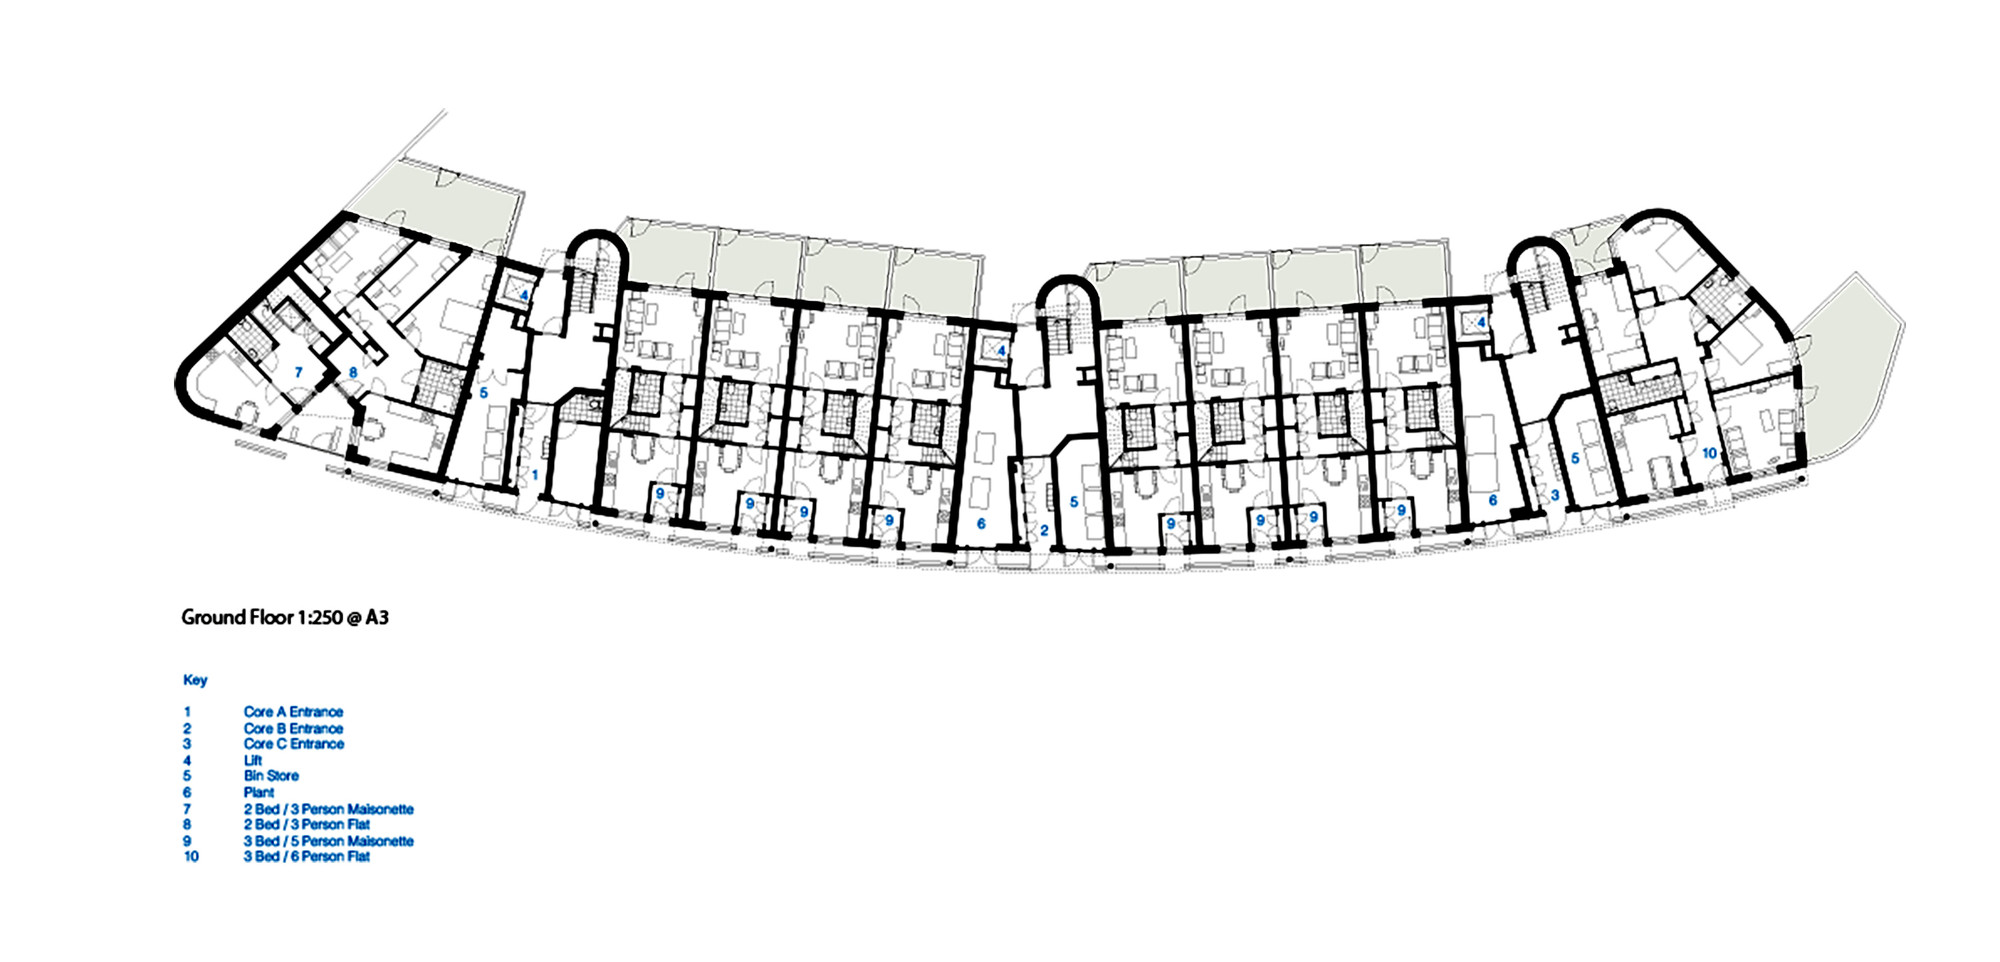 gallery of mint street peabody housing pitman tozer architects 12 zoom image view original size